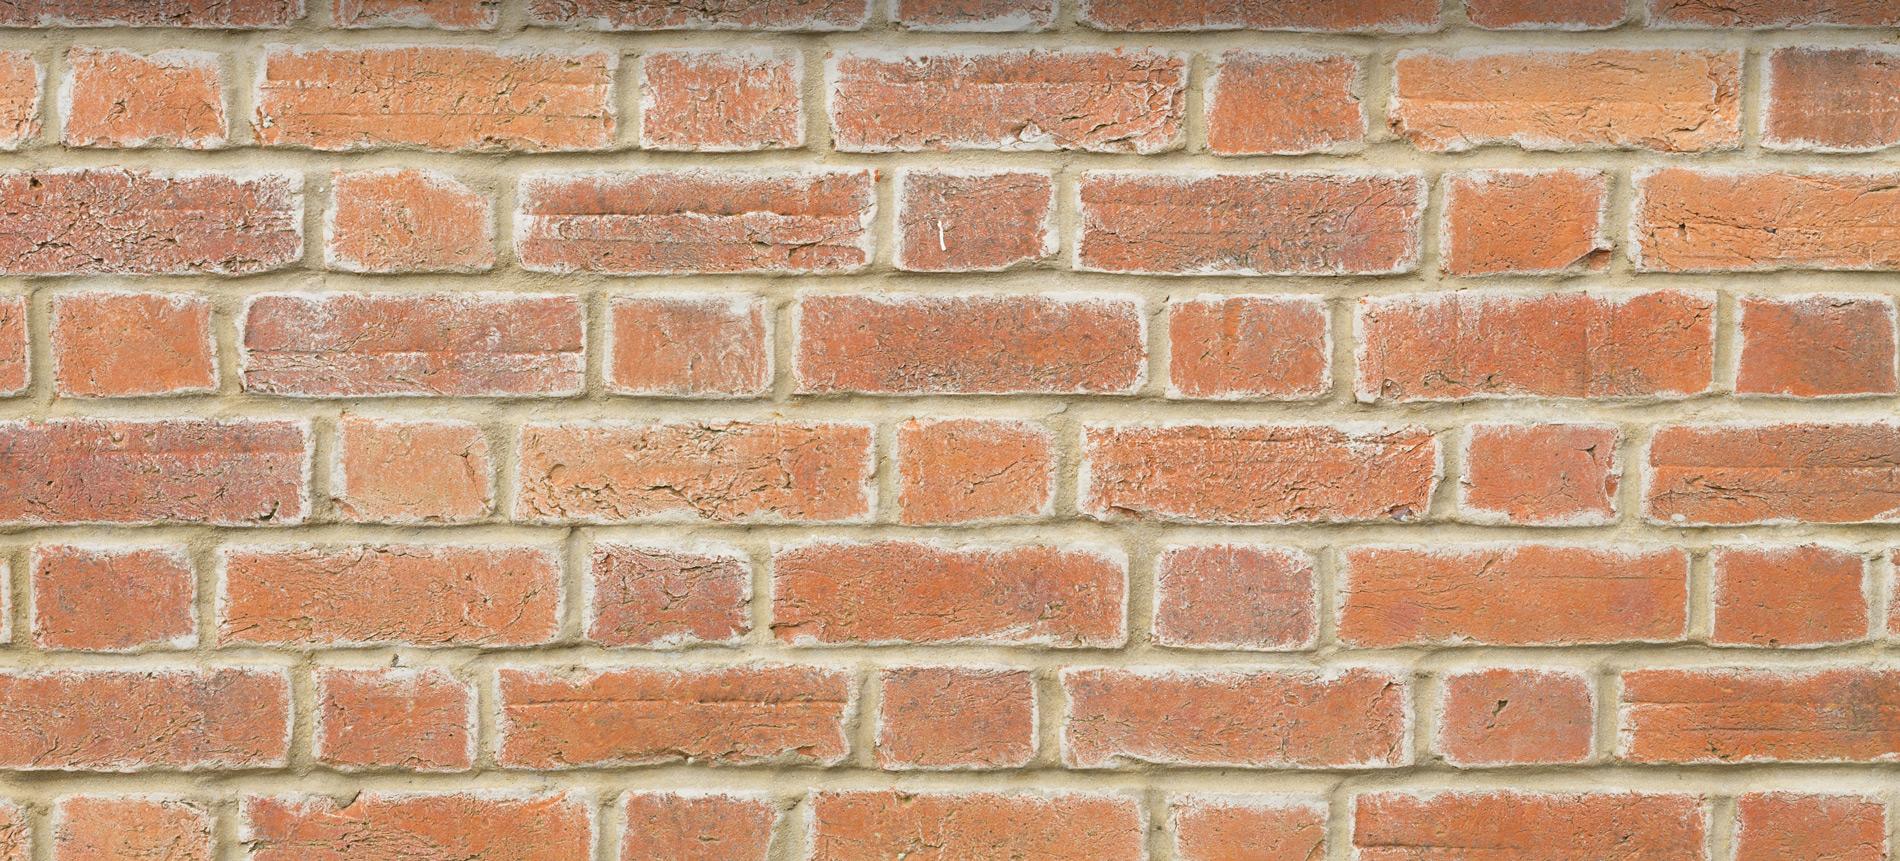 header-image-brick